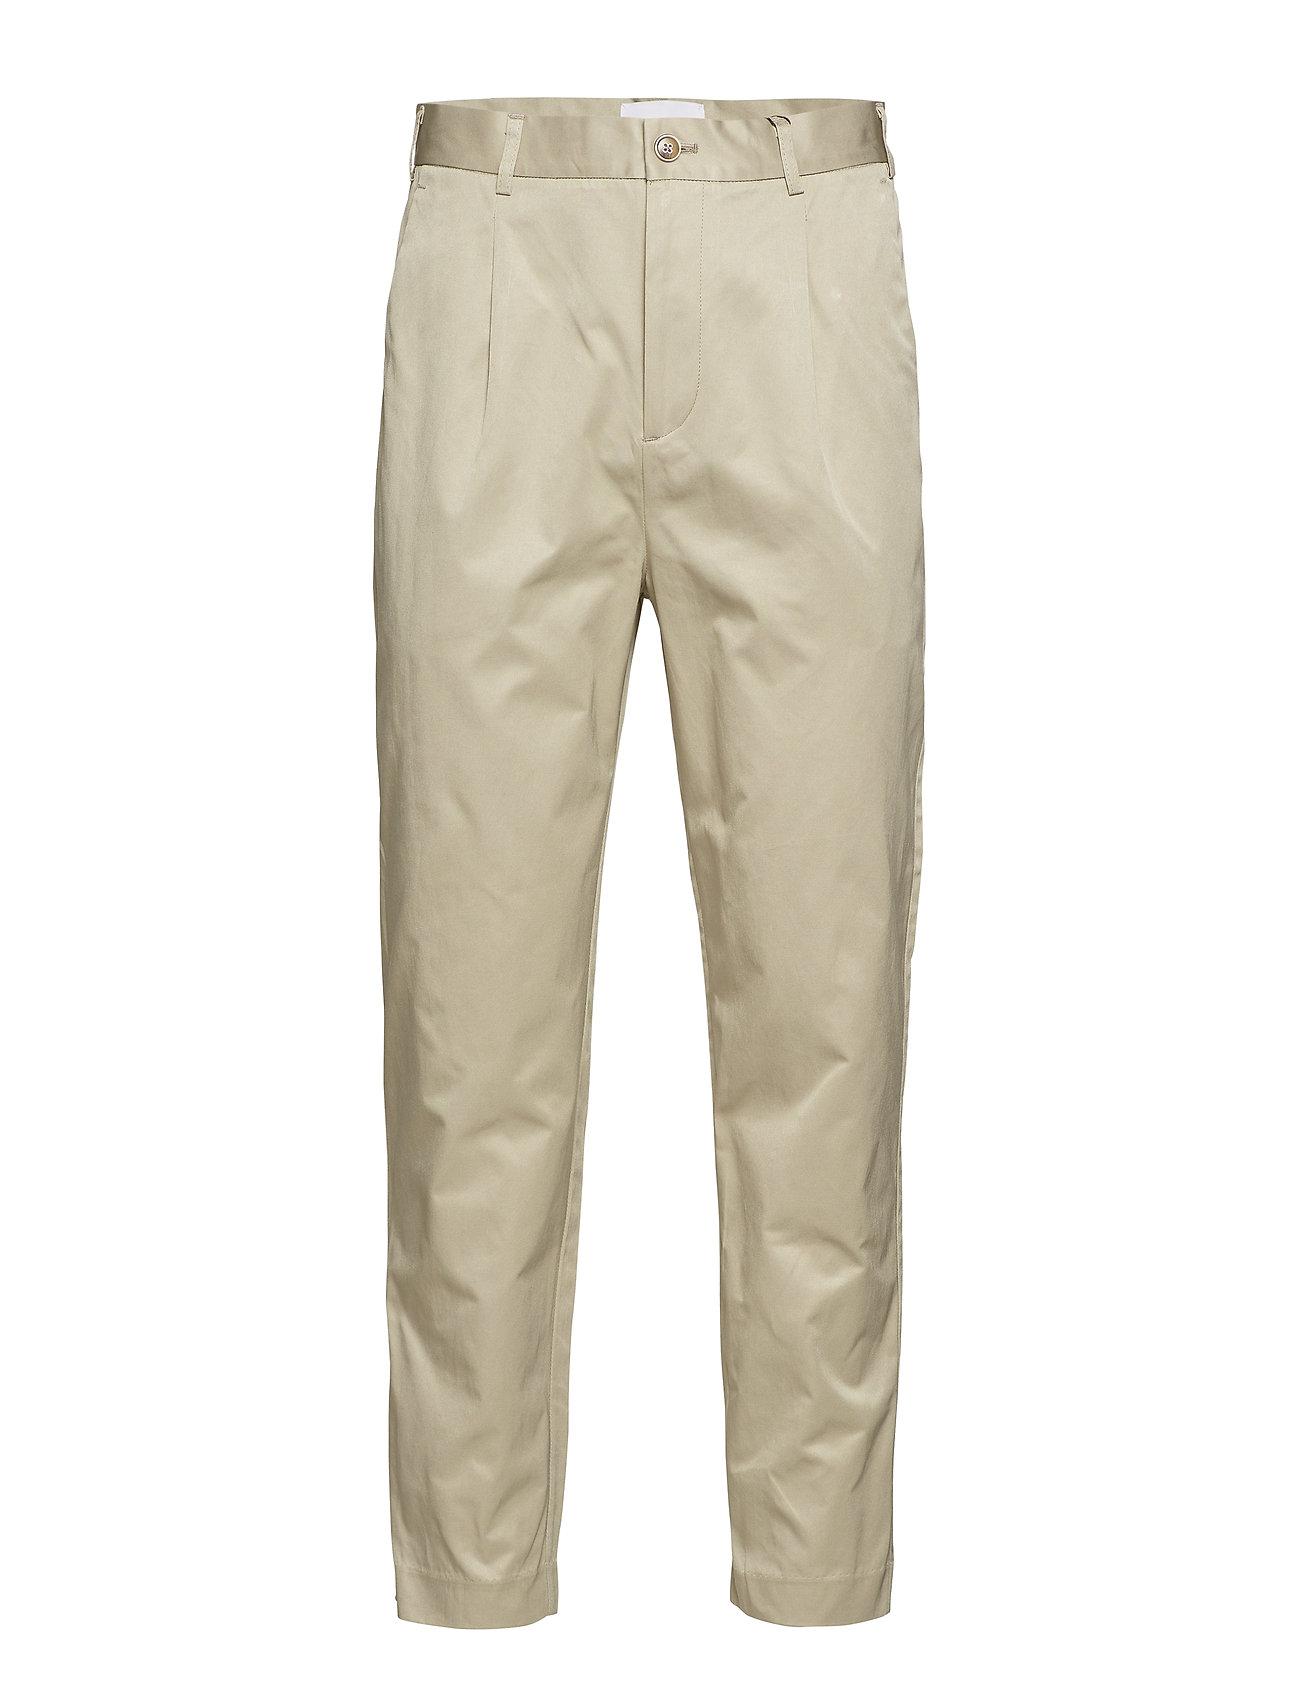 Image of Rino Trousers Chinos Bukser Beige HOLZWEILER (3182128339)